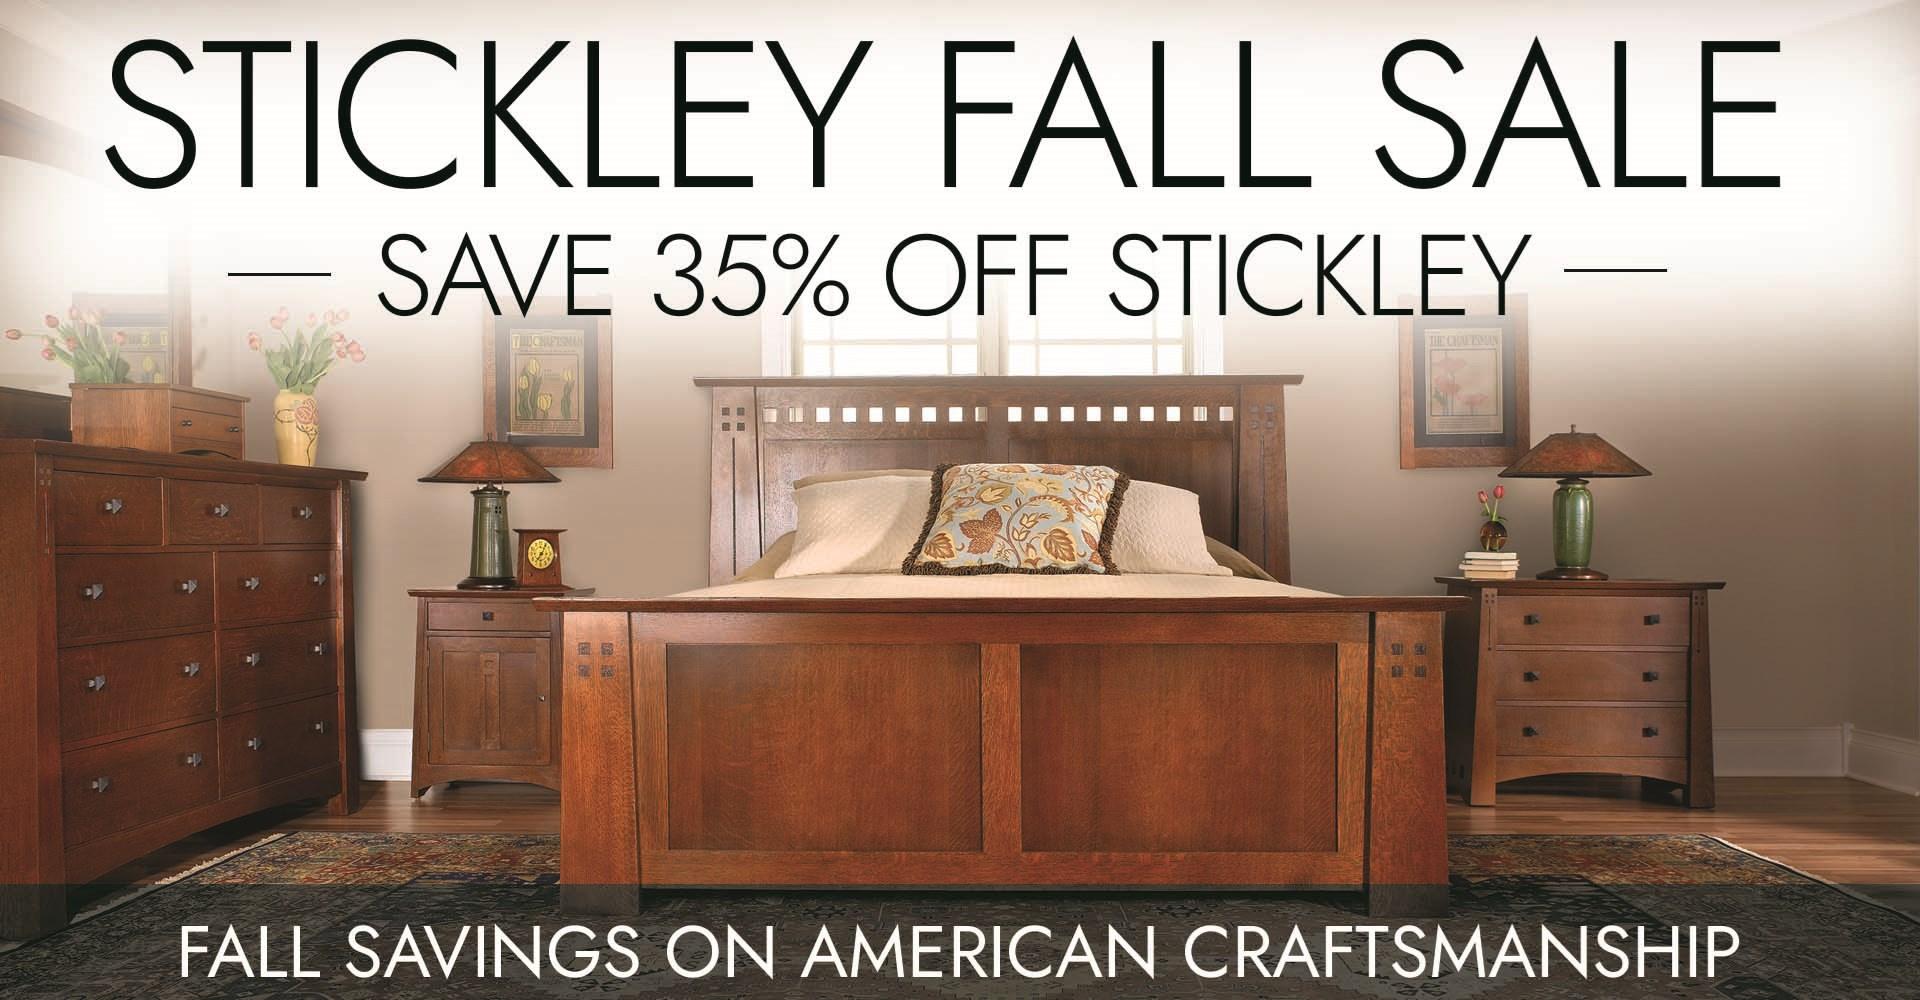 Stickley Fall Sale